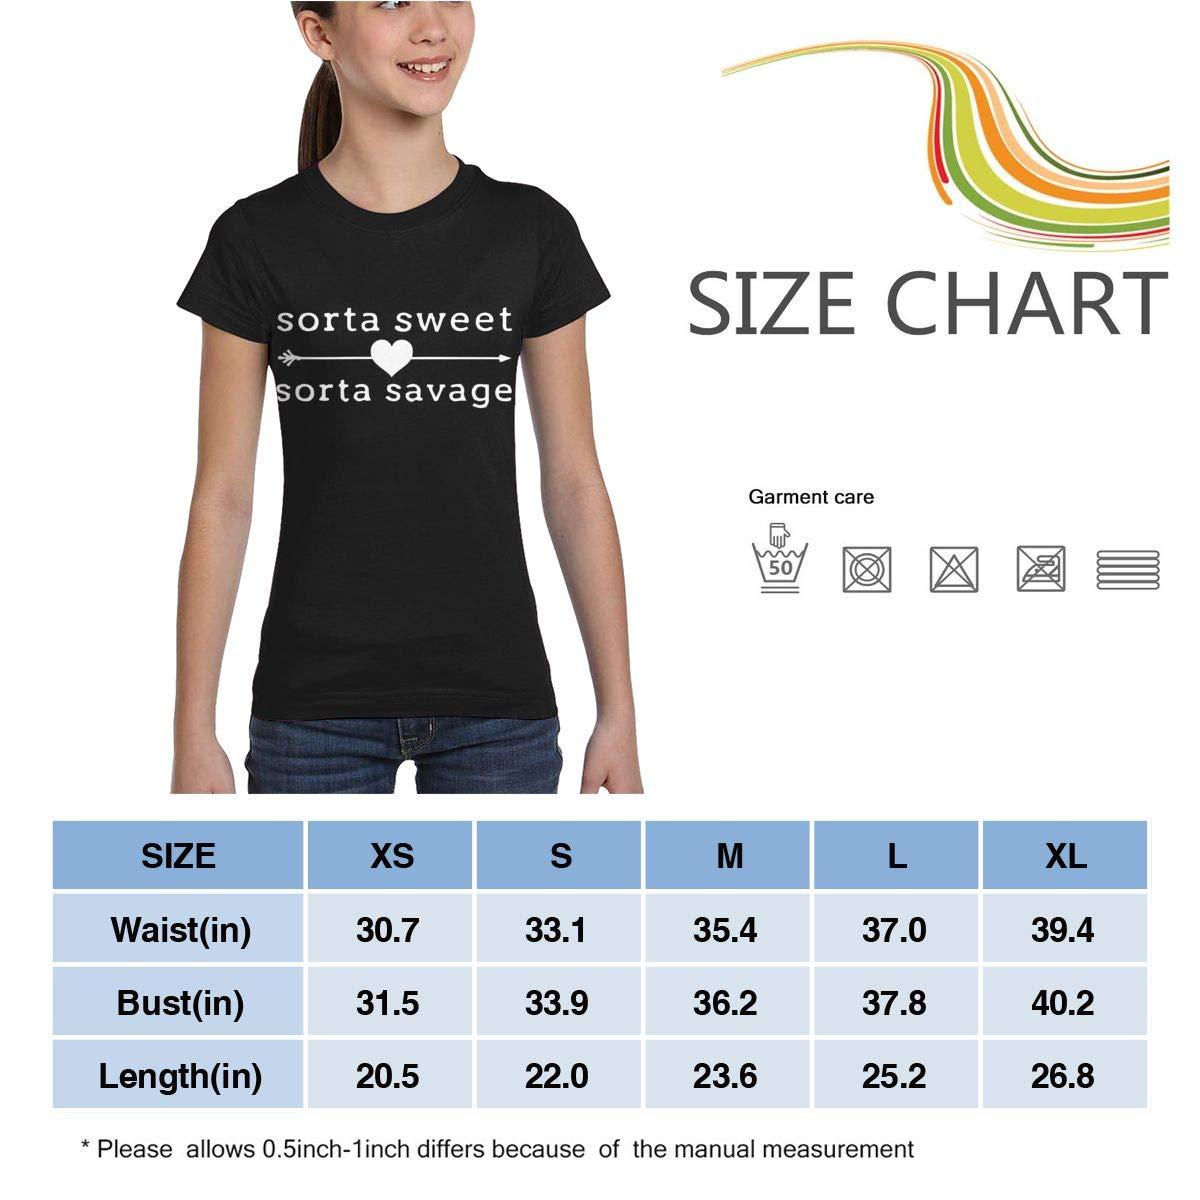 Casual Tunic Shirt Dress XS-XL L6Nv4o@A Girls Short Sleeve Sorta Sweet Sorta Savage Shirts